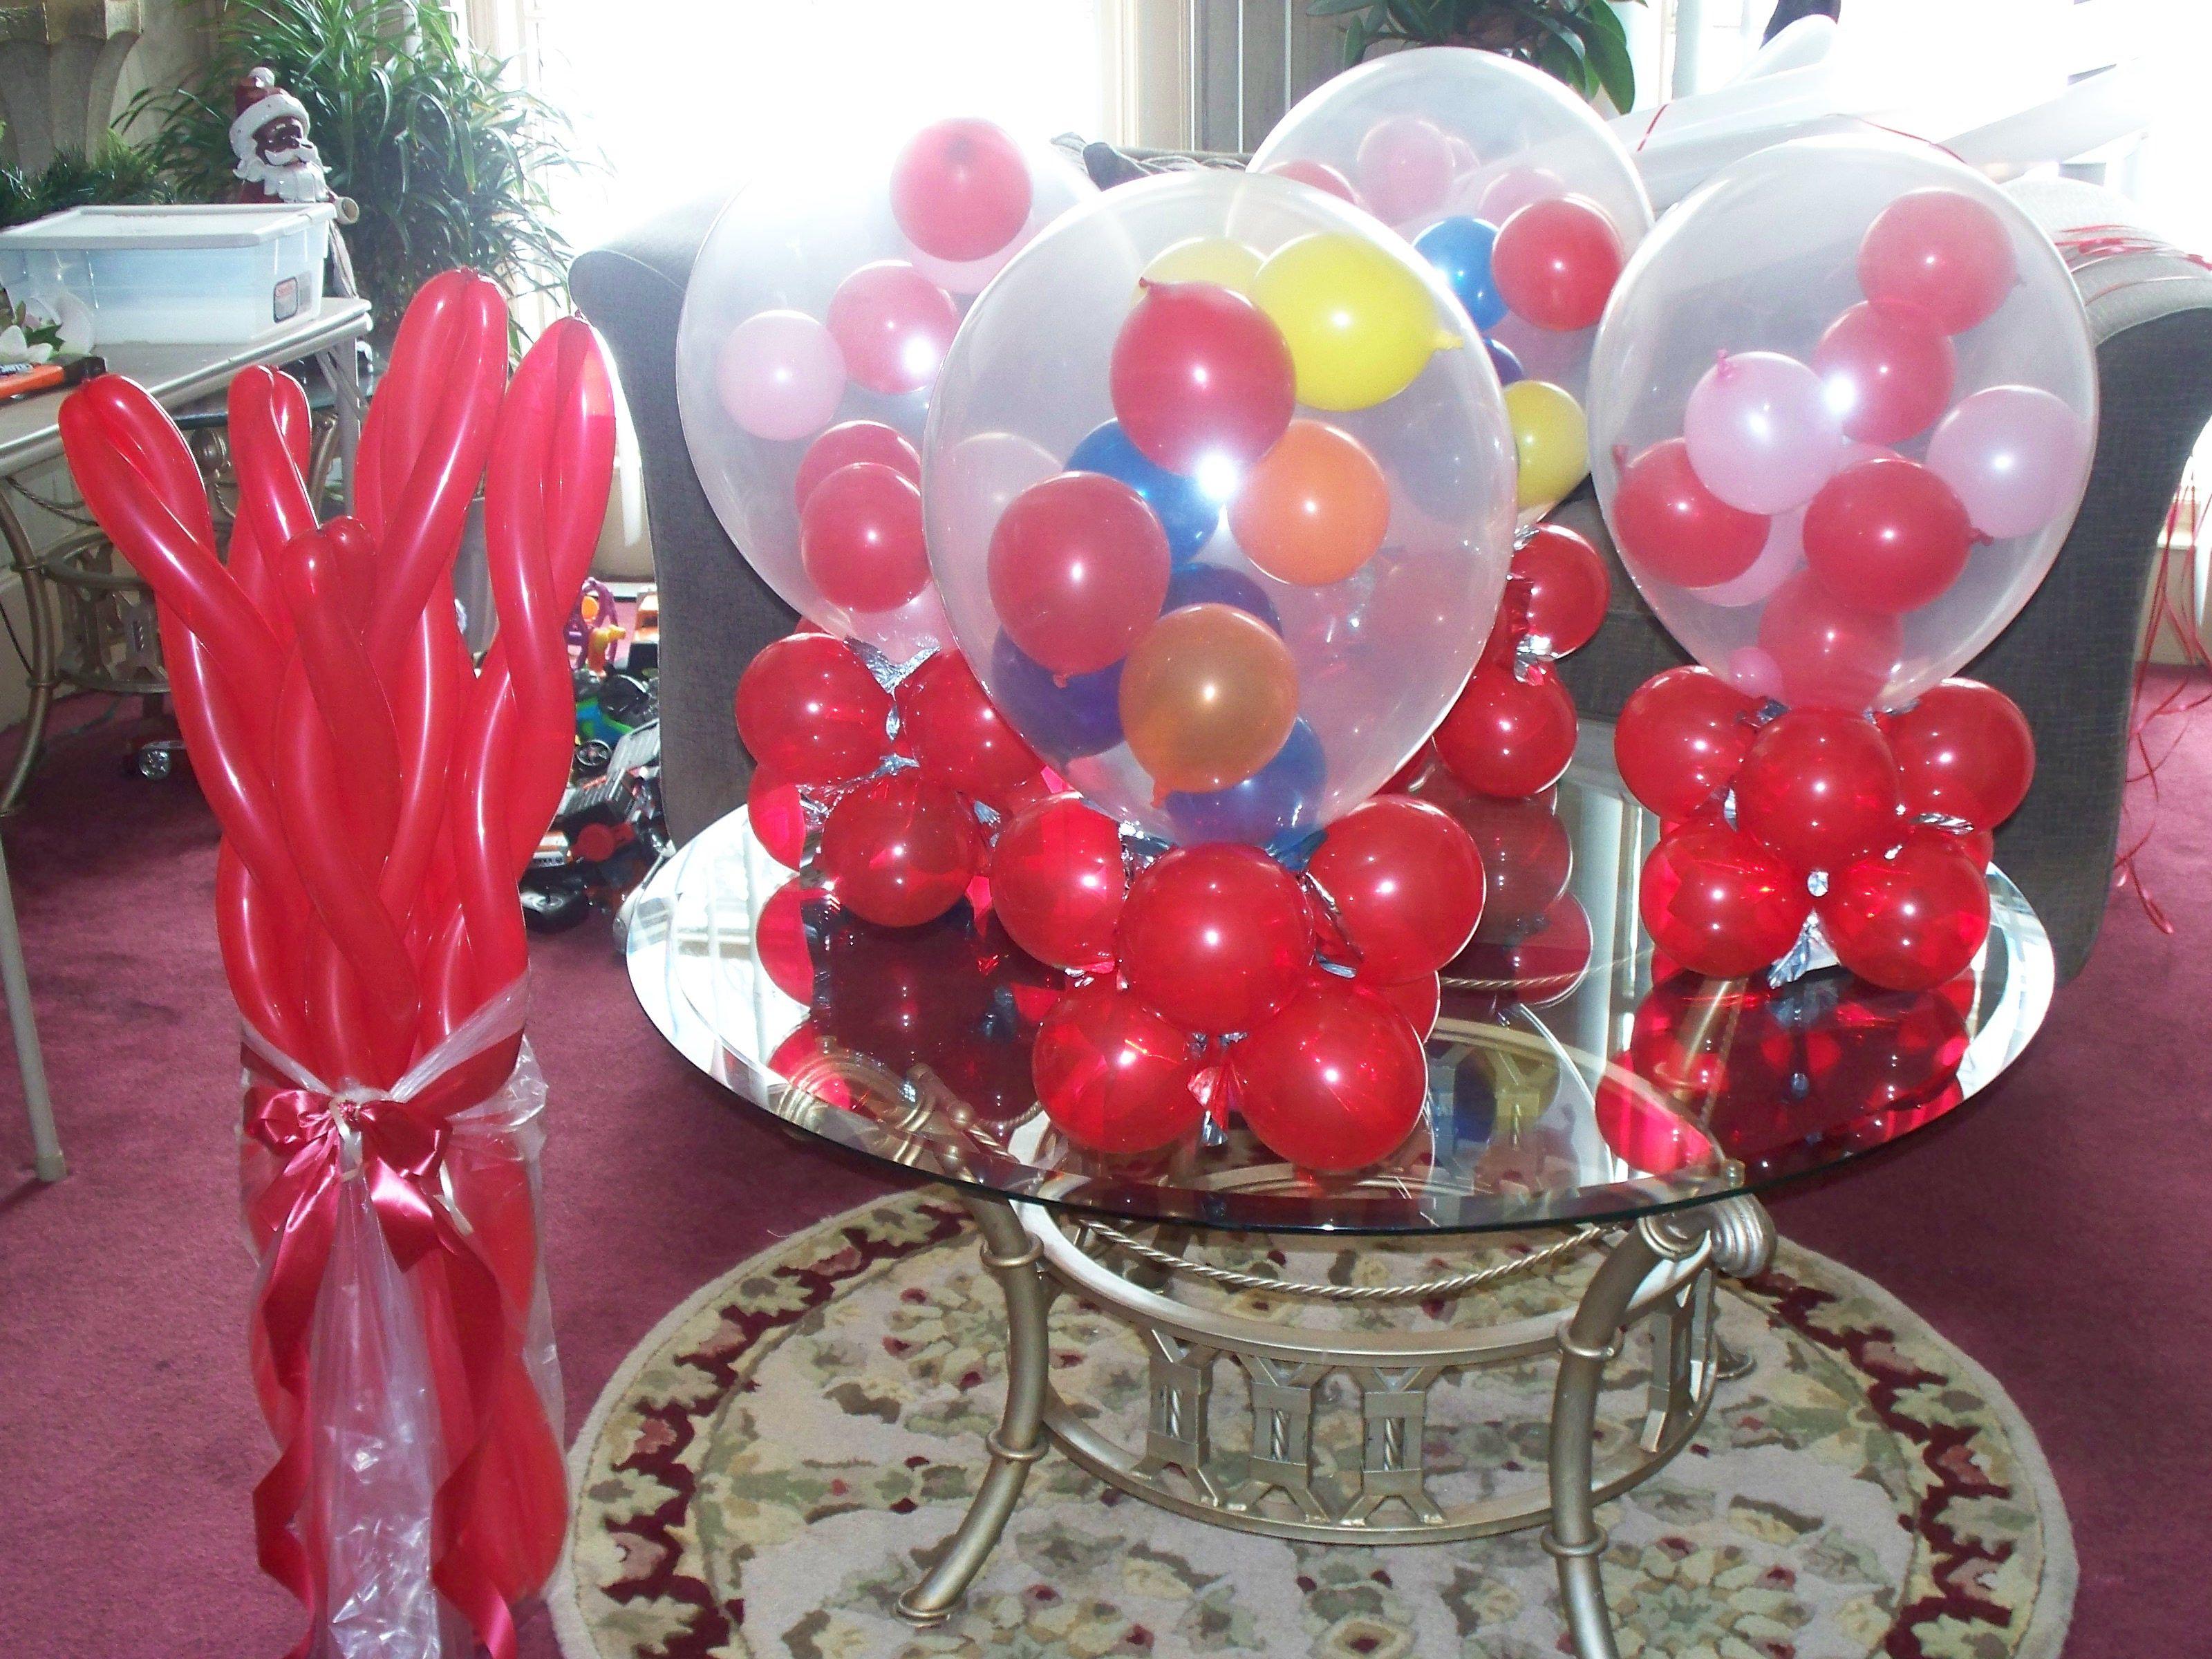 Candy themed centerpiece ideas party pinterest